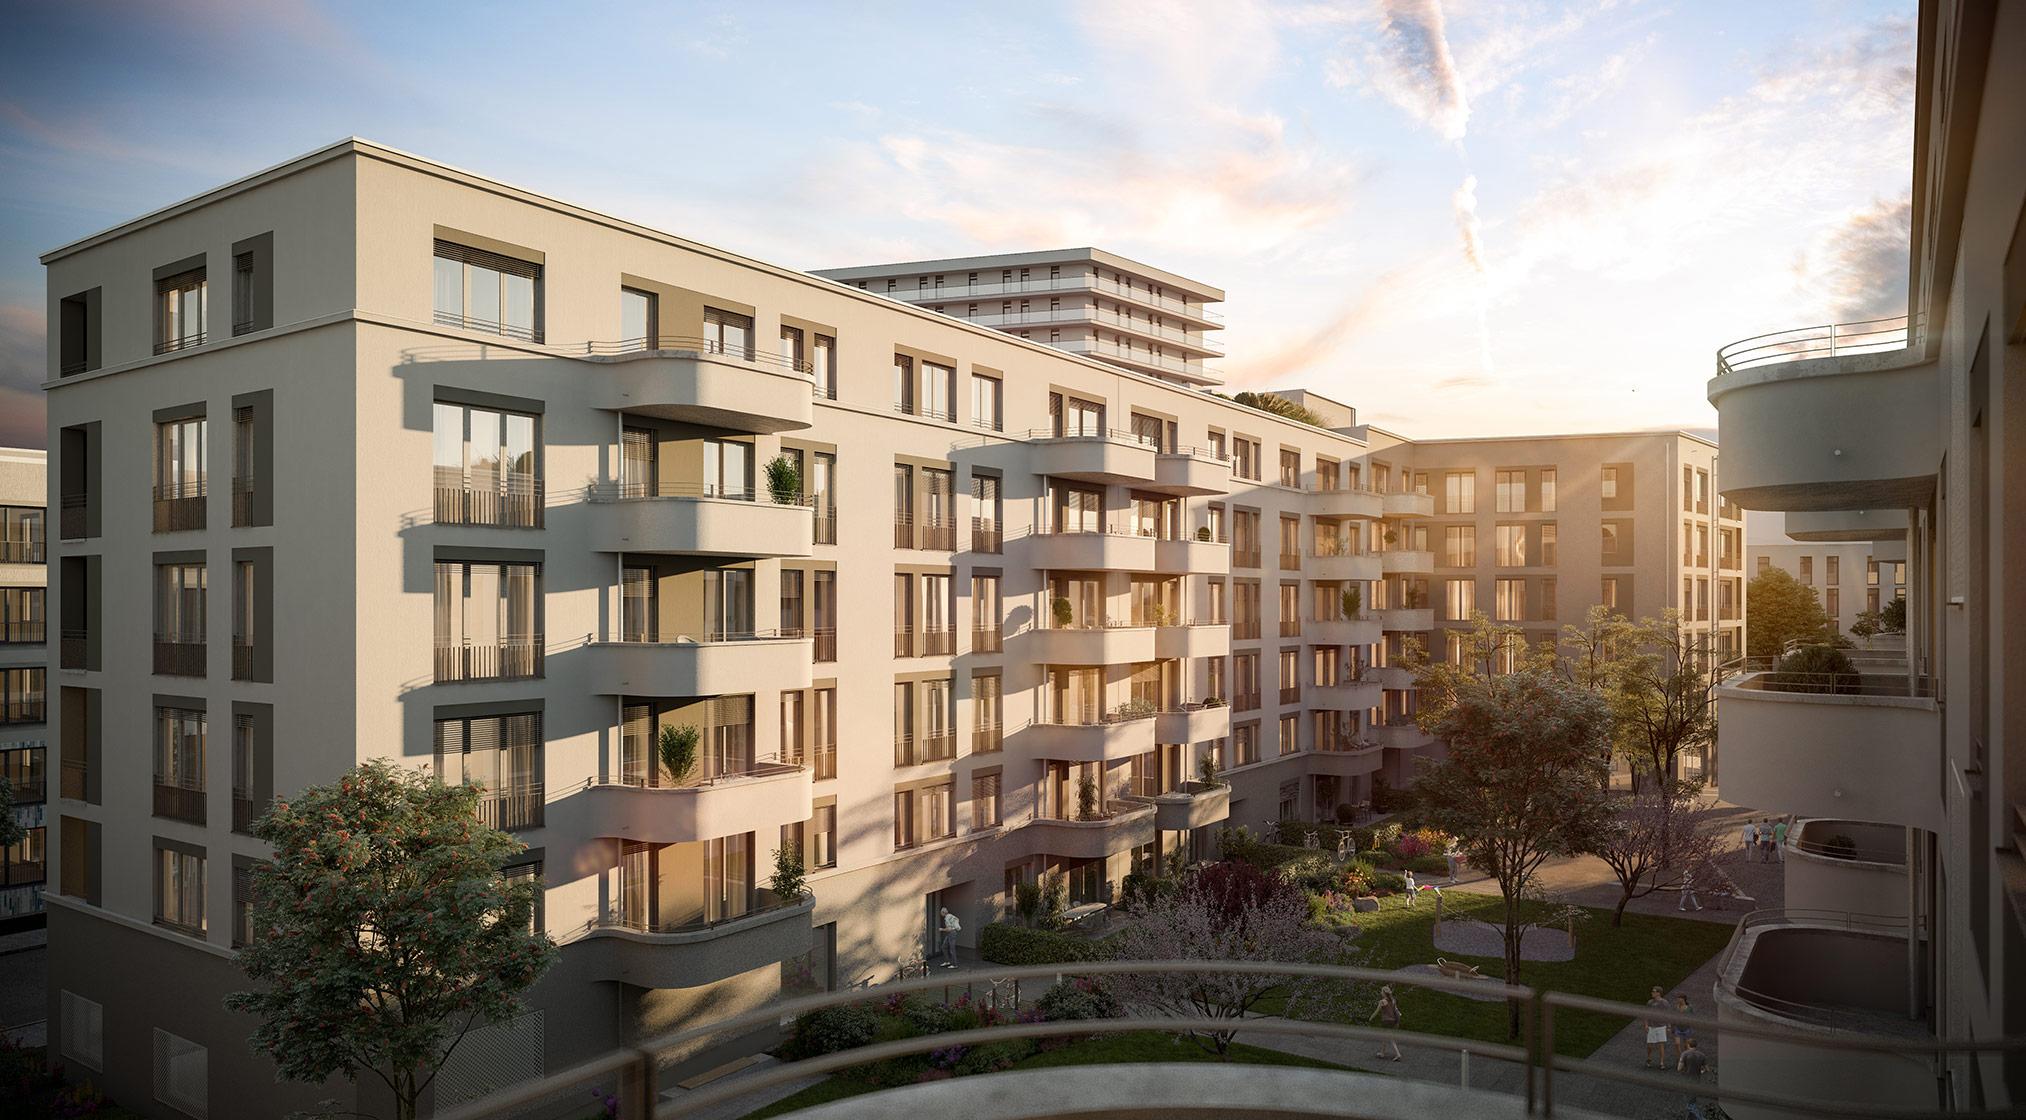 Immobilie Alexisquartier - Das Duett - Projektdetails - Illustration 1